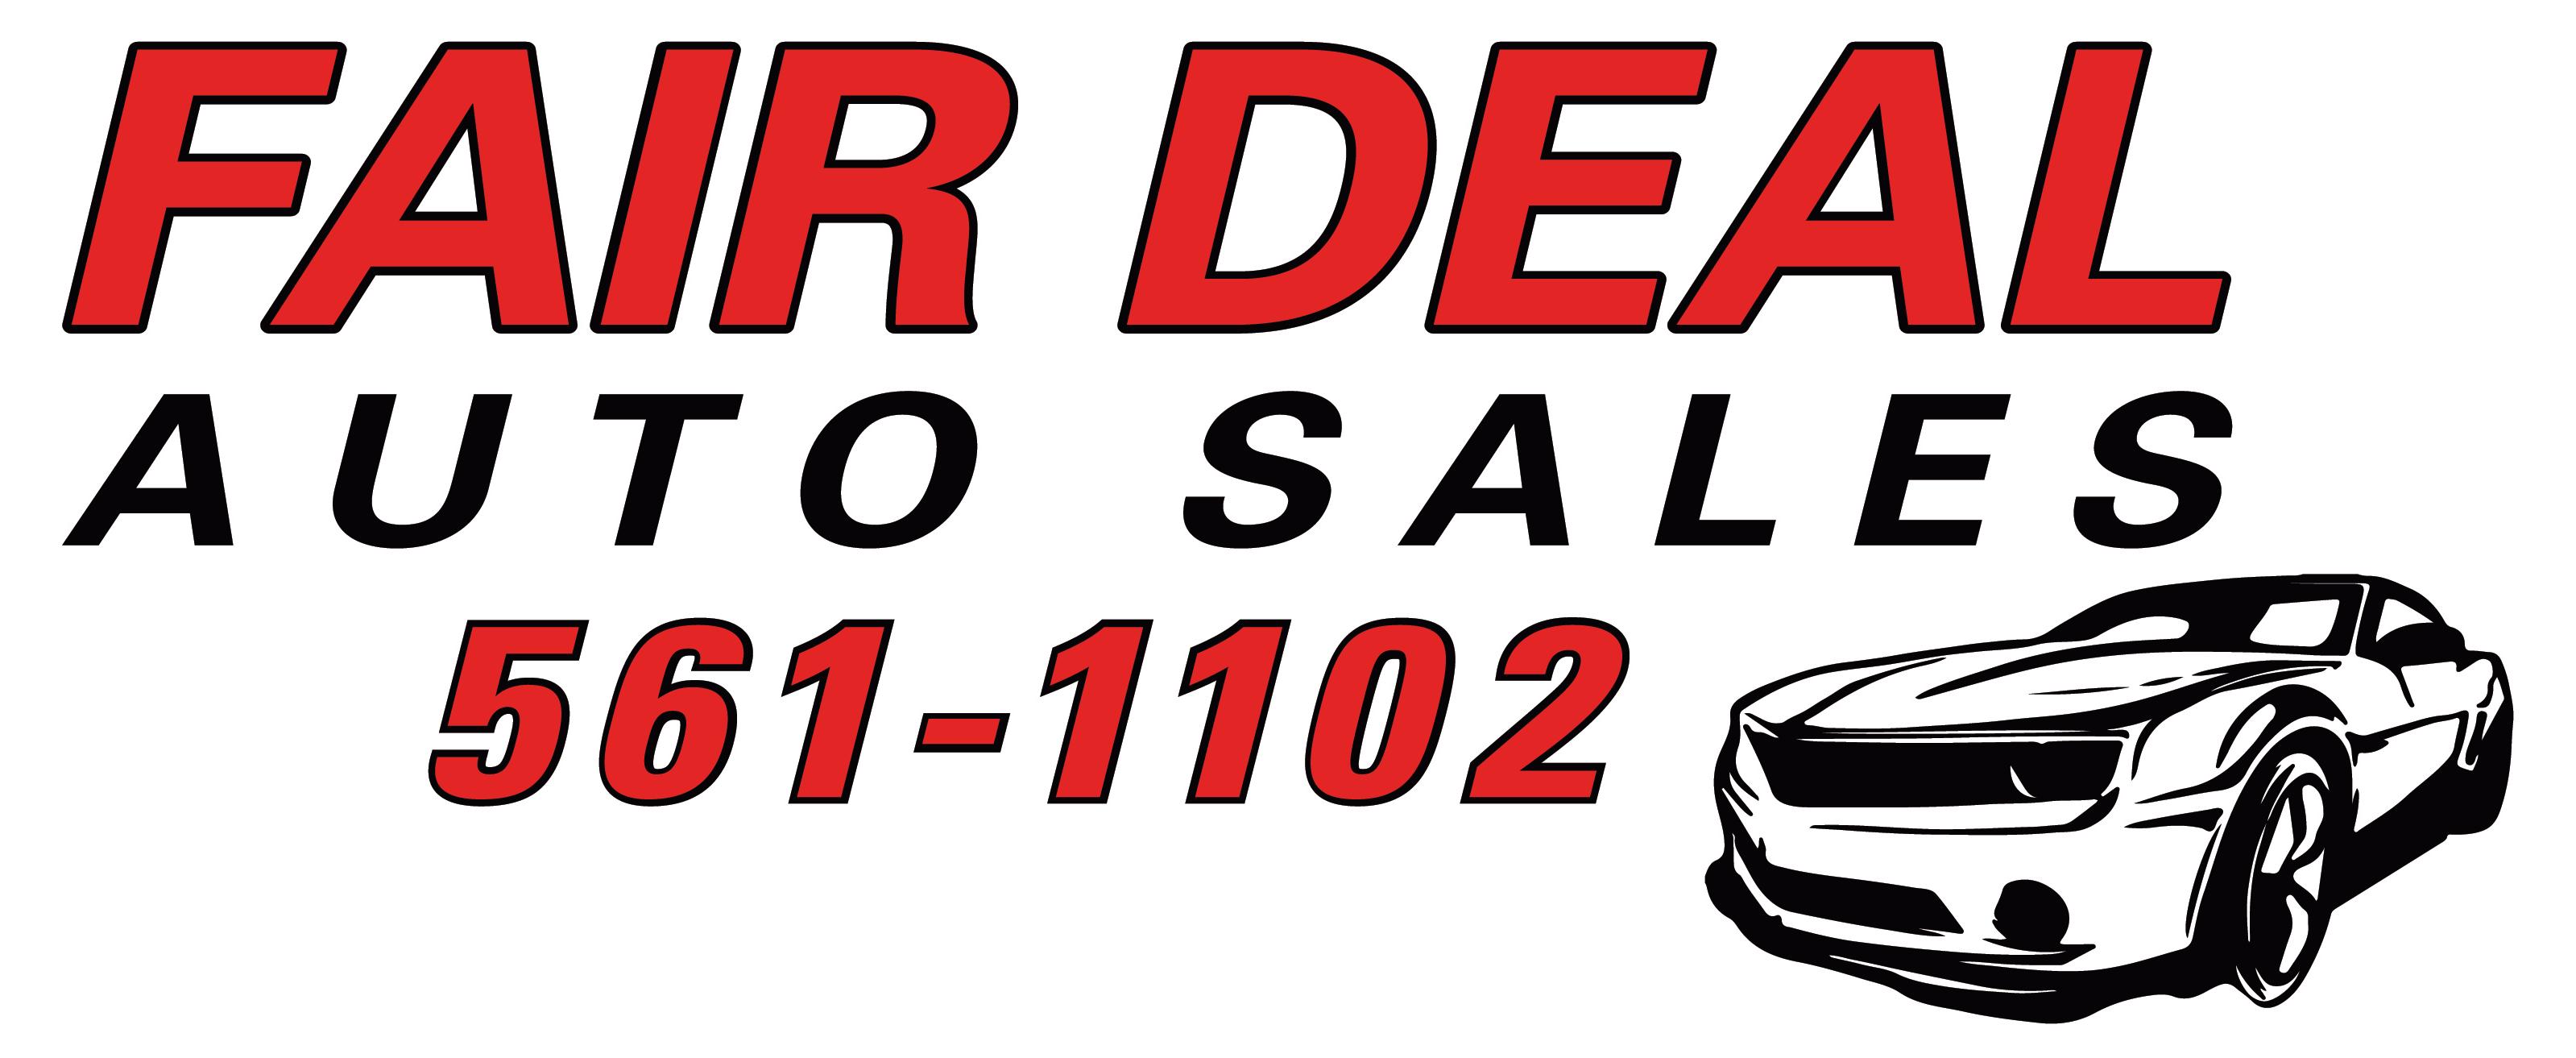 Fair Deal Auto Finance logo